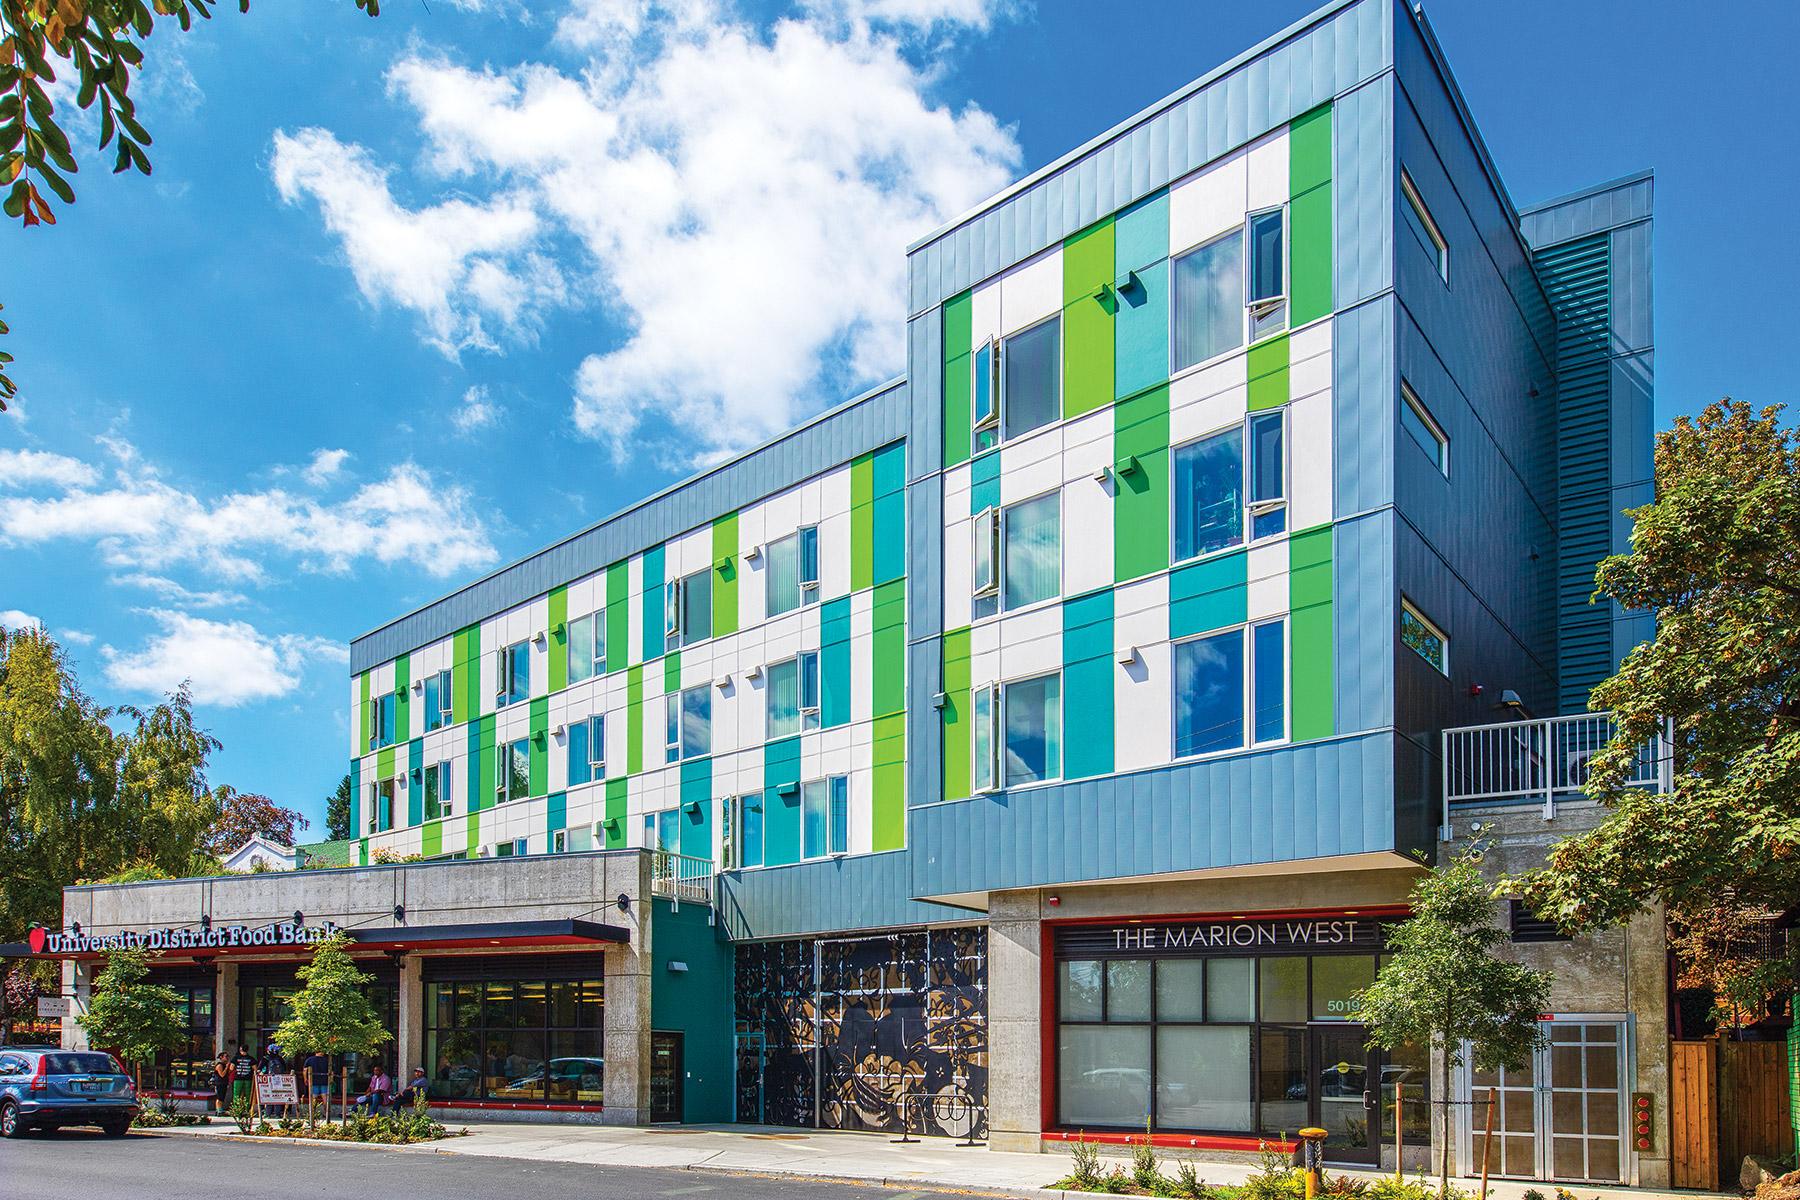 Seattle Development Creates Vibrant Mixed Use Community